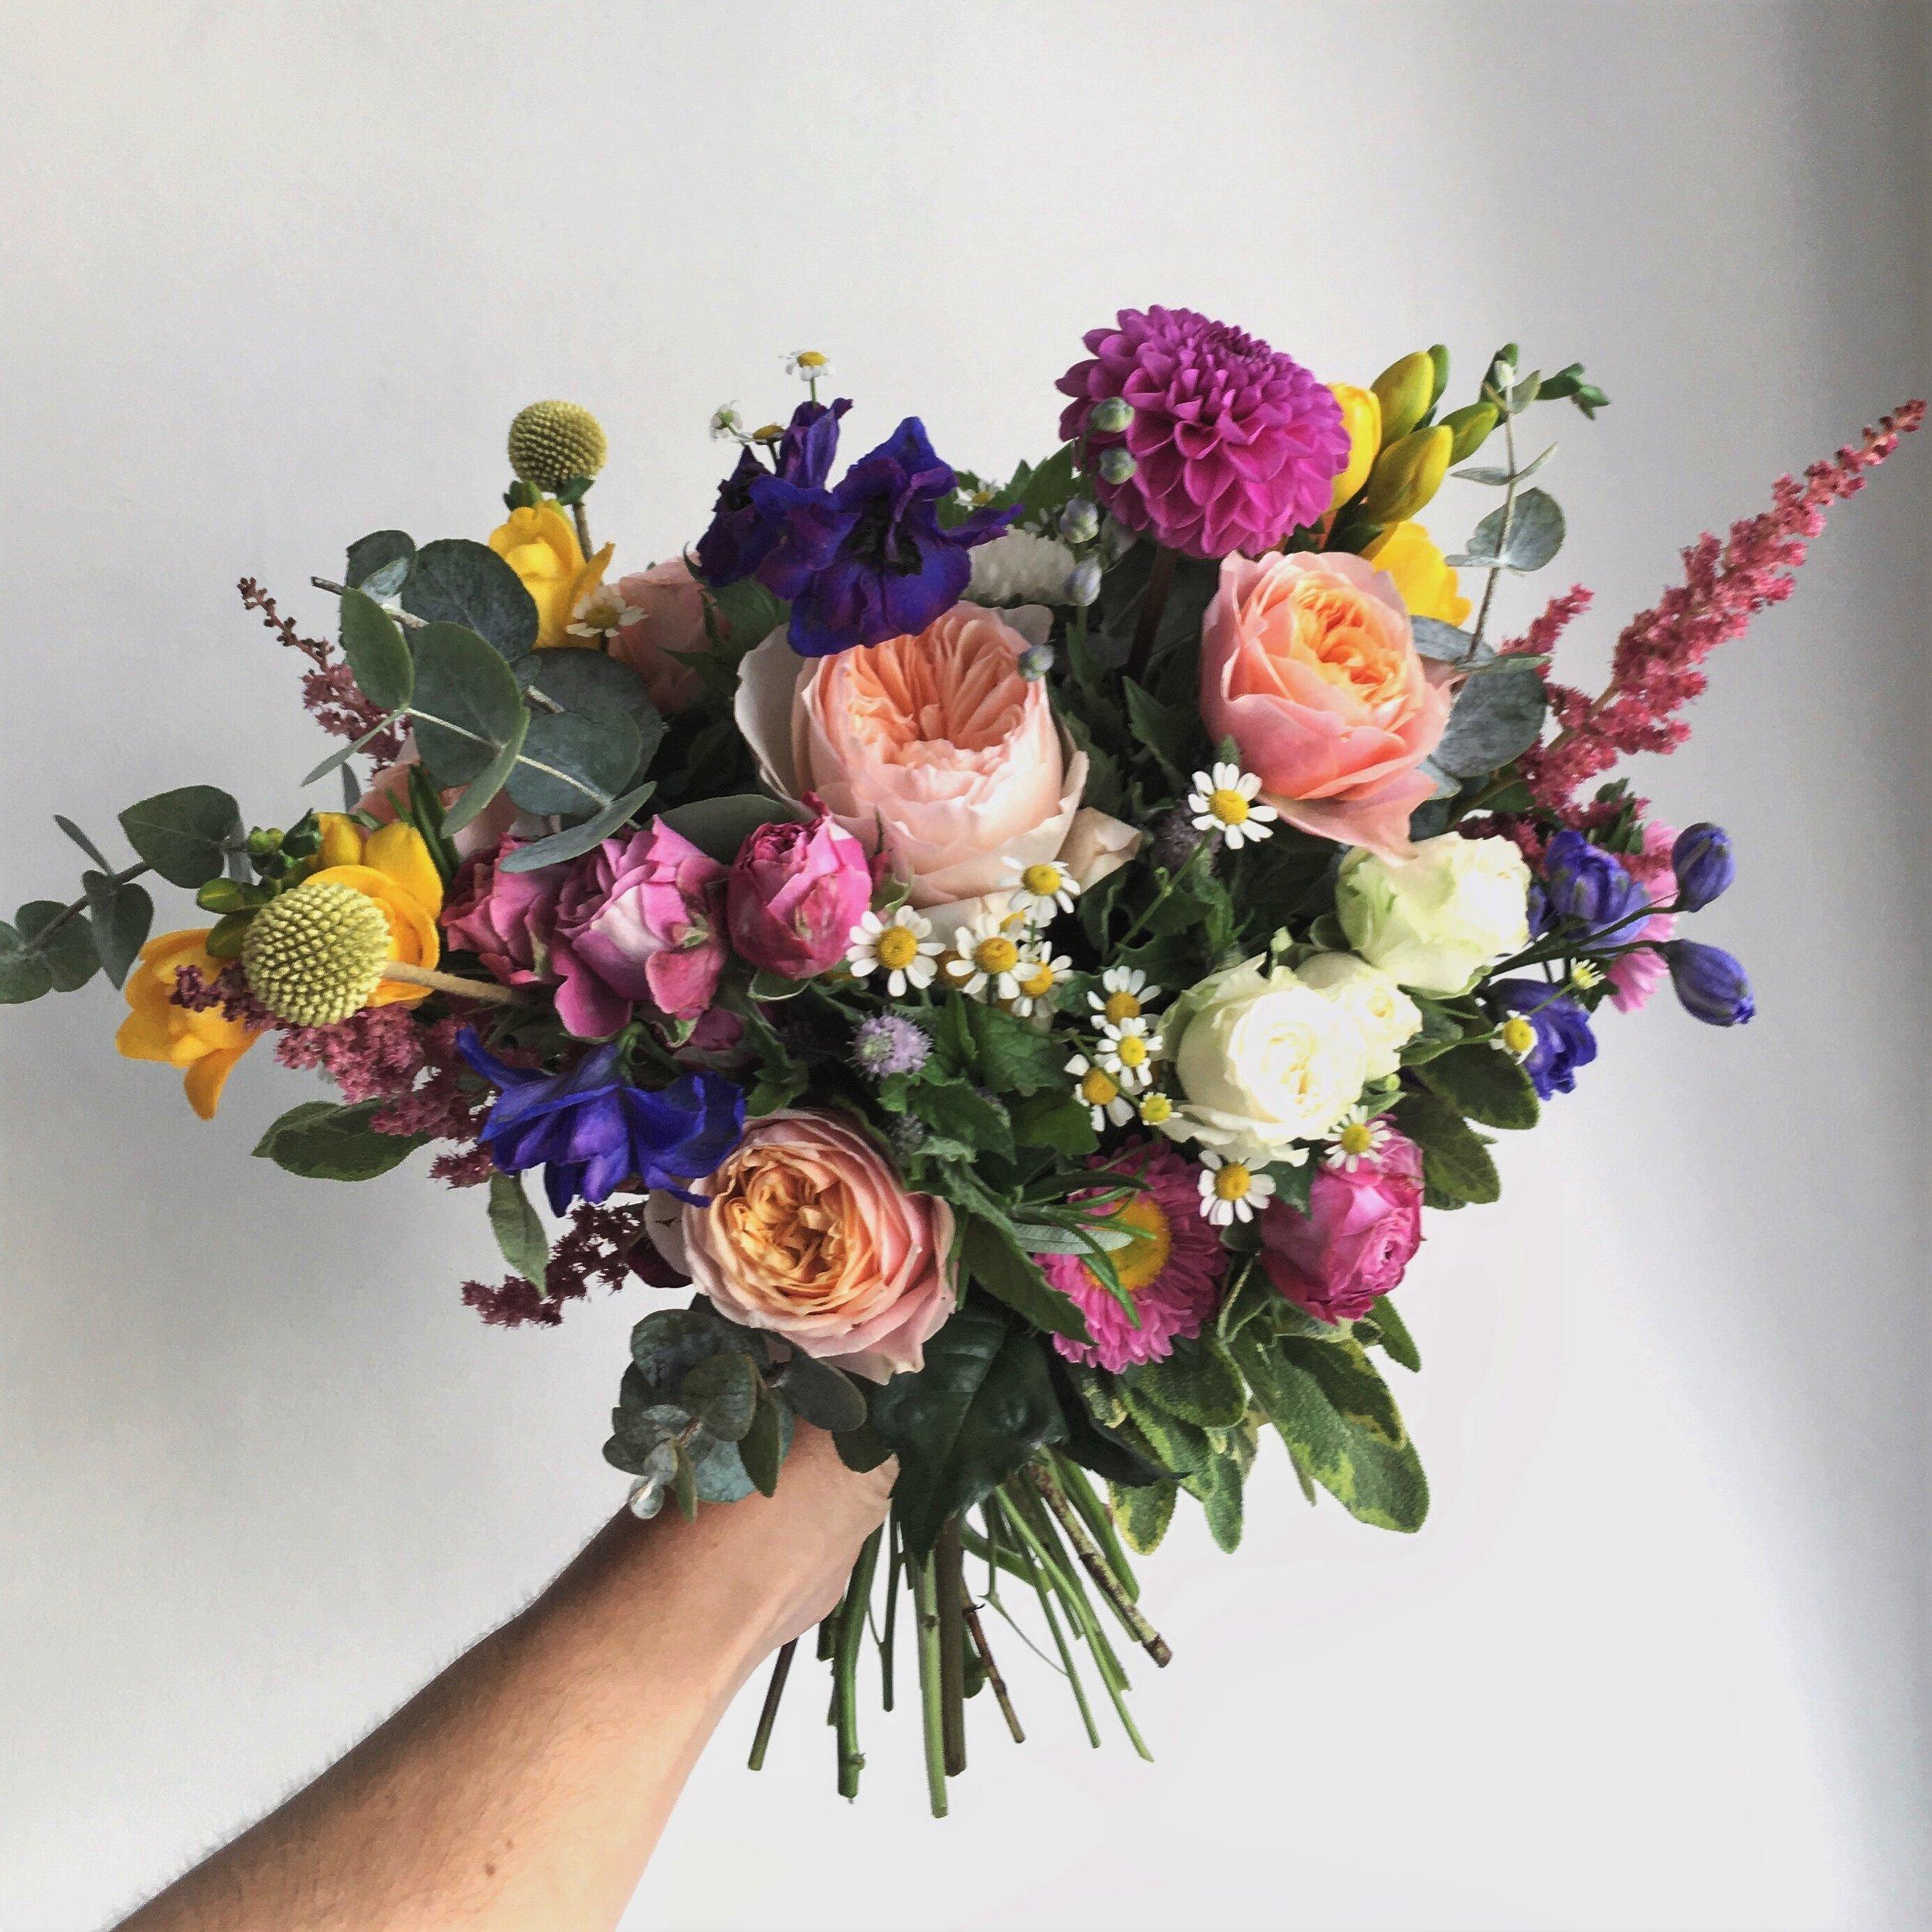 Wedding-Flowers-Brighton-Sussex-Florist-Bridal-Webb-and-Farrer (10).JPG